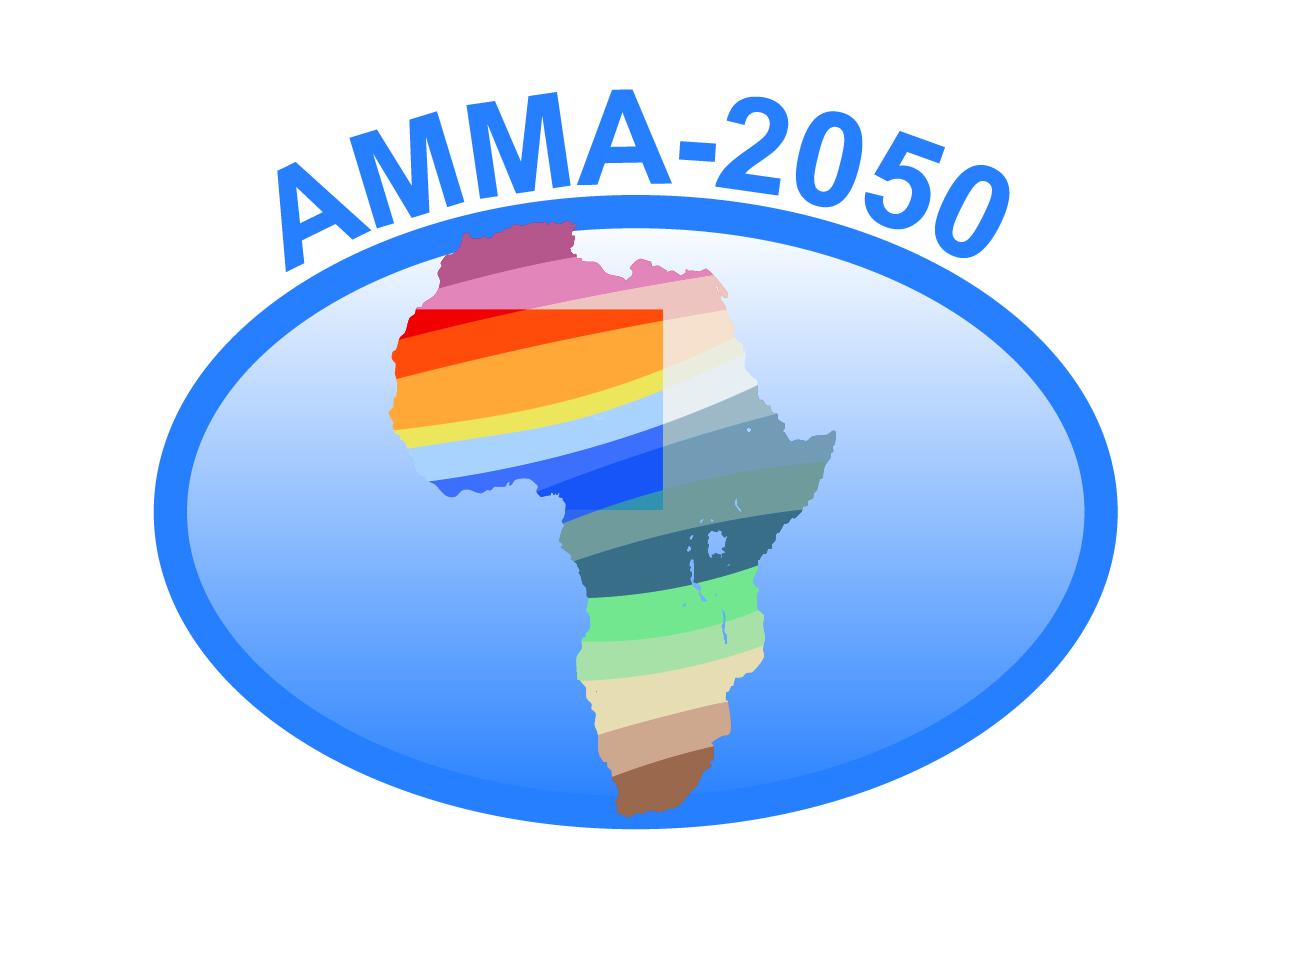 Amma2050 logo